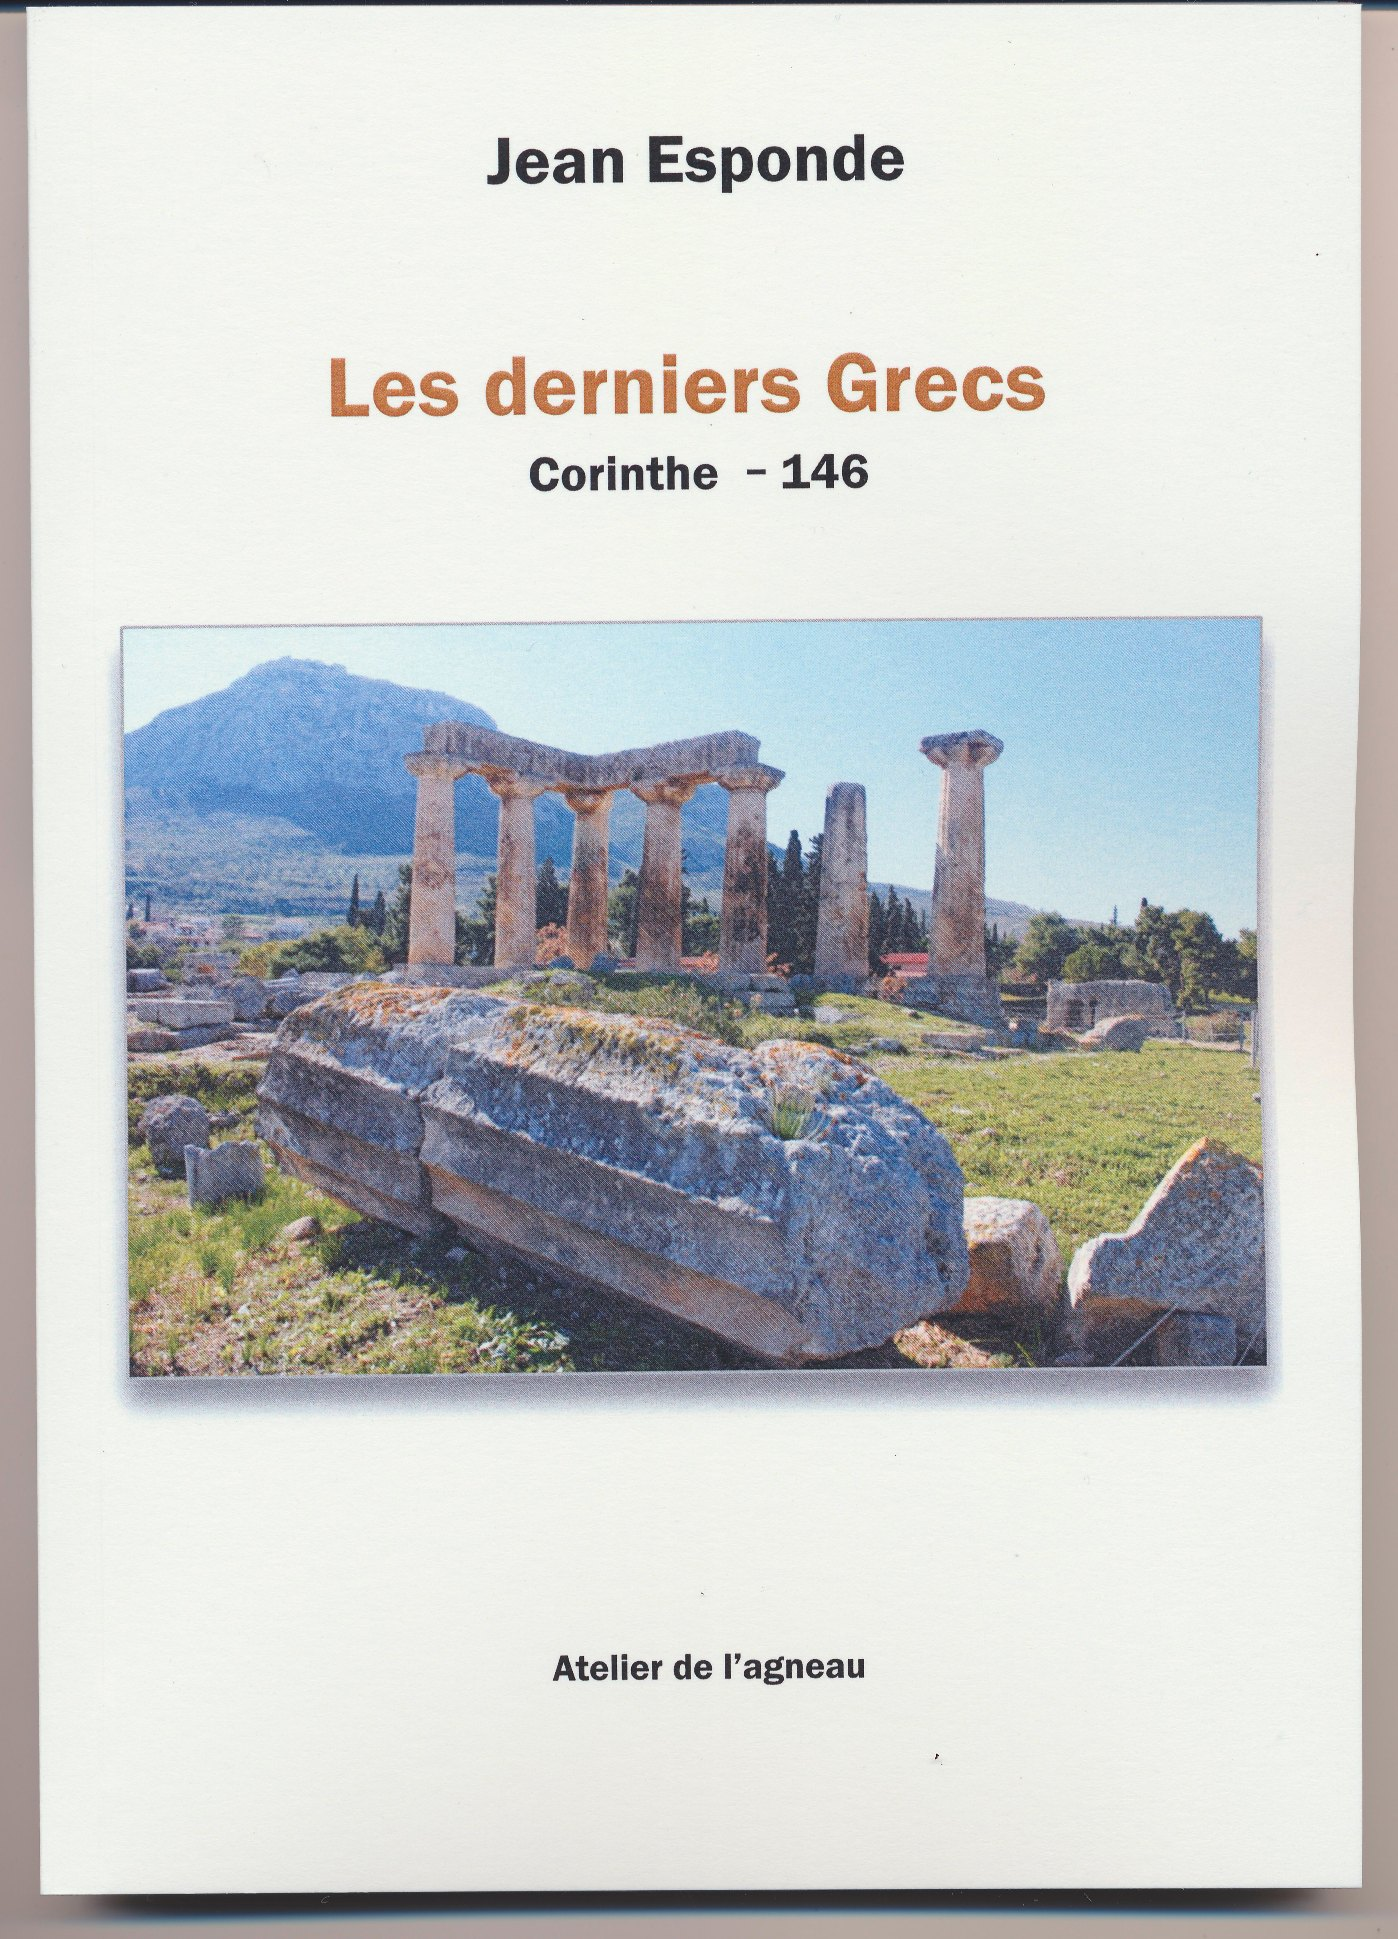 grecs-530-ko